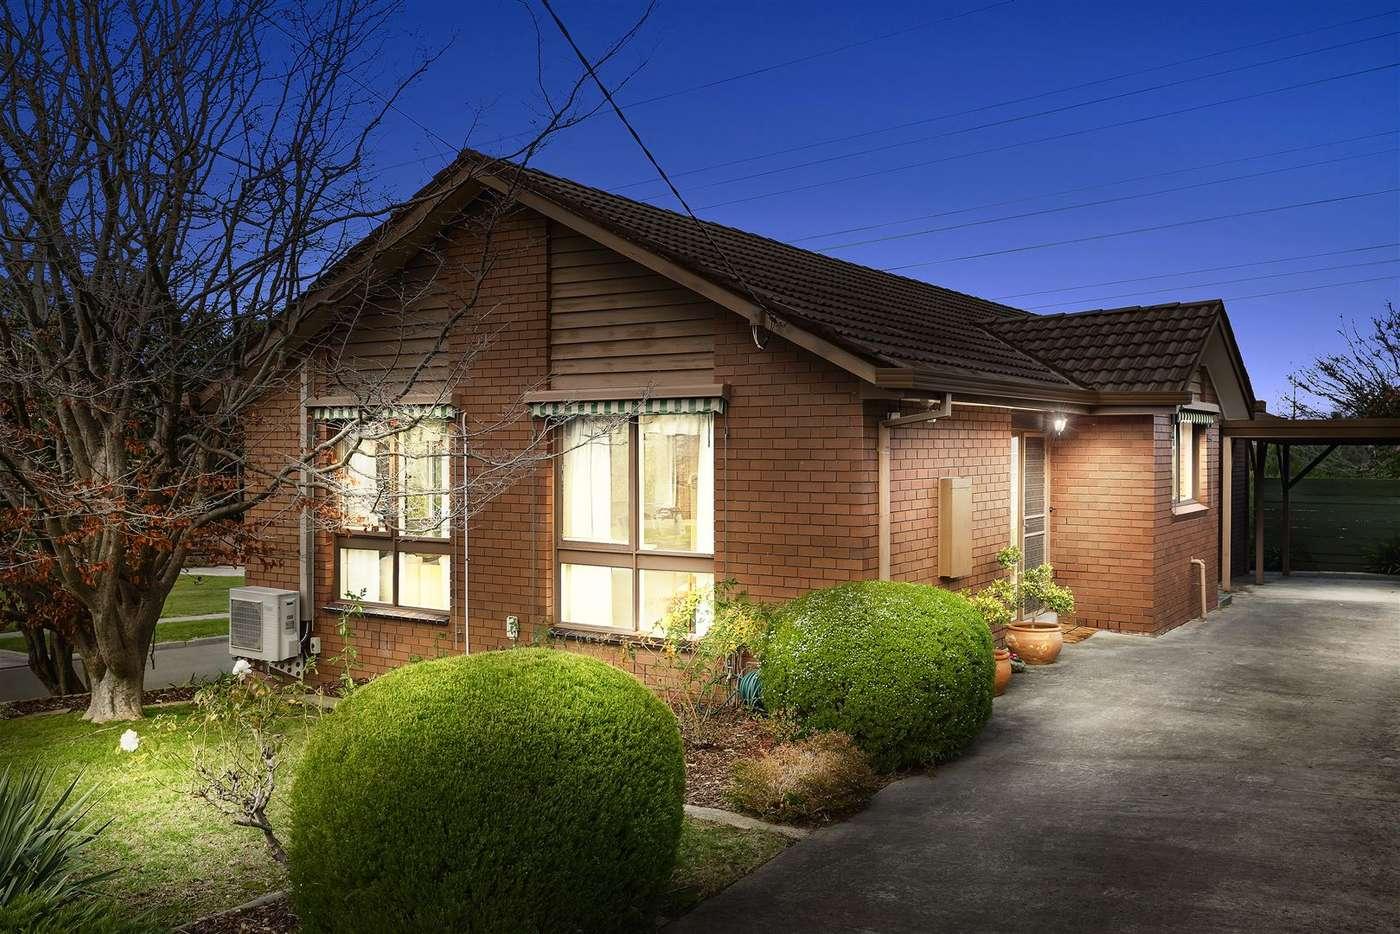 Main view of Homely house listing, 50 Sandgate Avenue, Glen Waverley VIC 3150